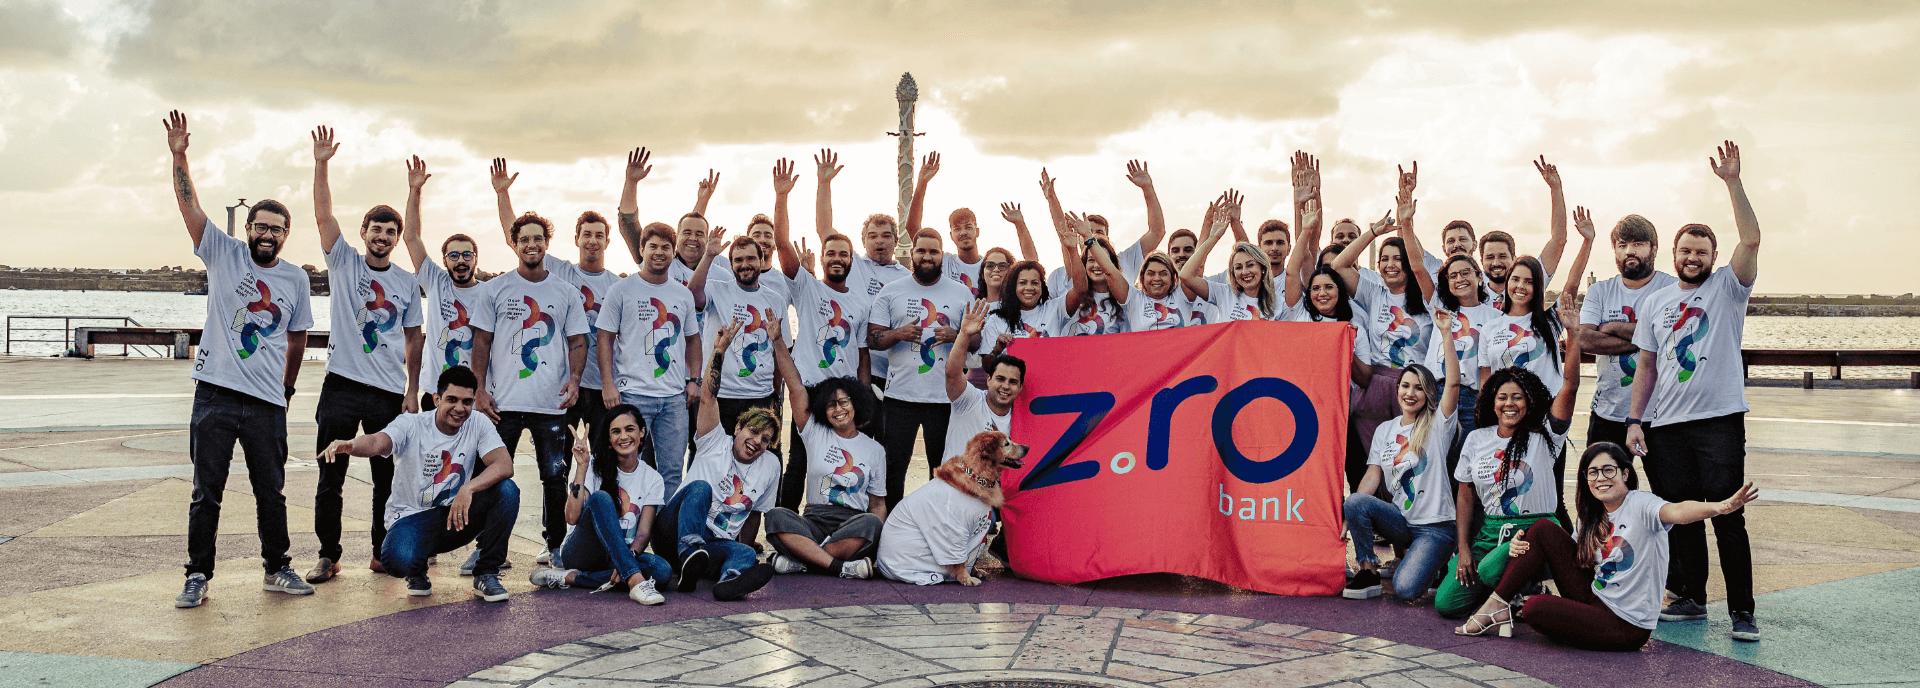 Equipe Zro